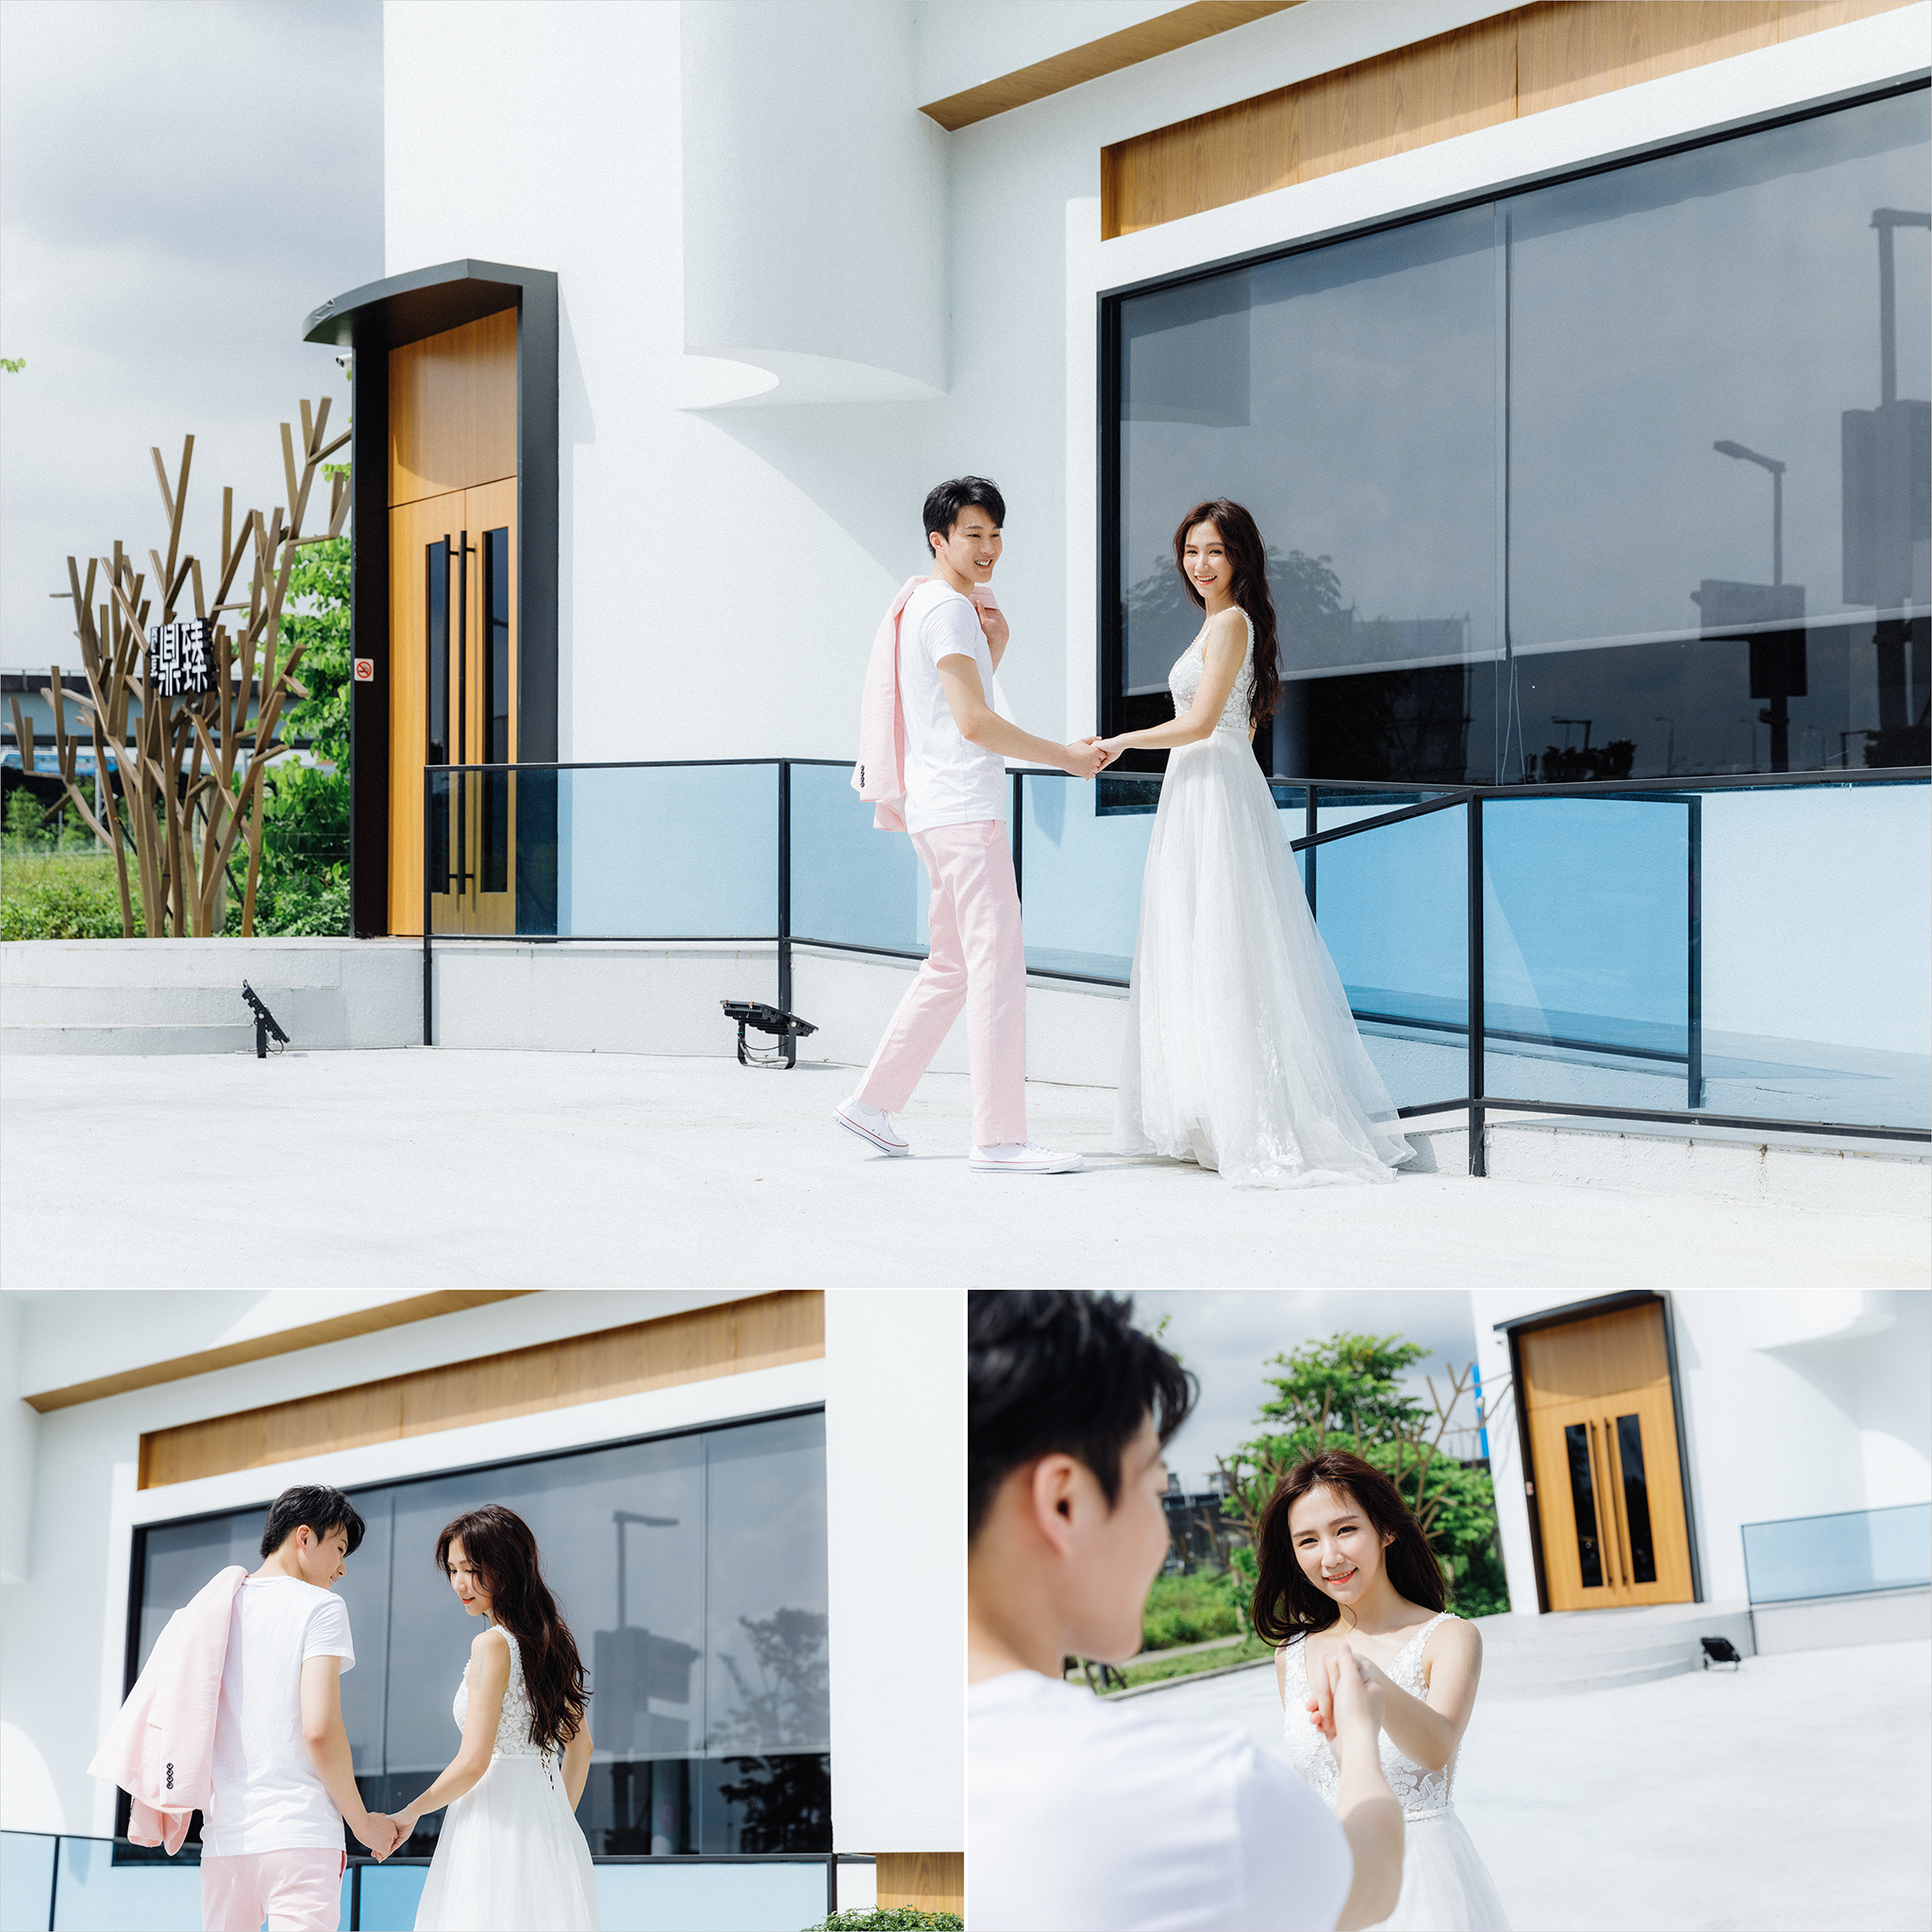 48592344372 e148cd5722 o - 【自主婚紗】+Ying&Wiwi+